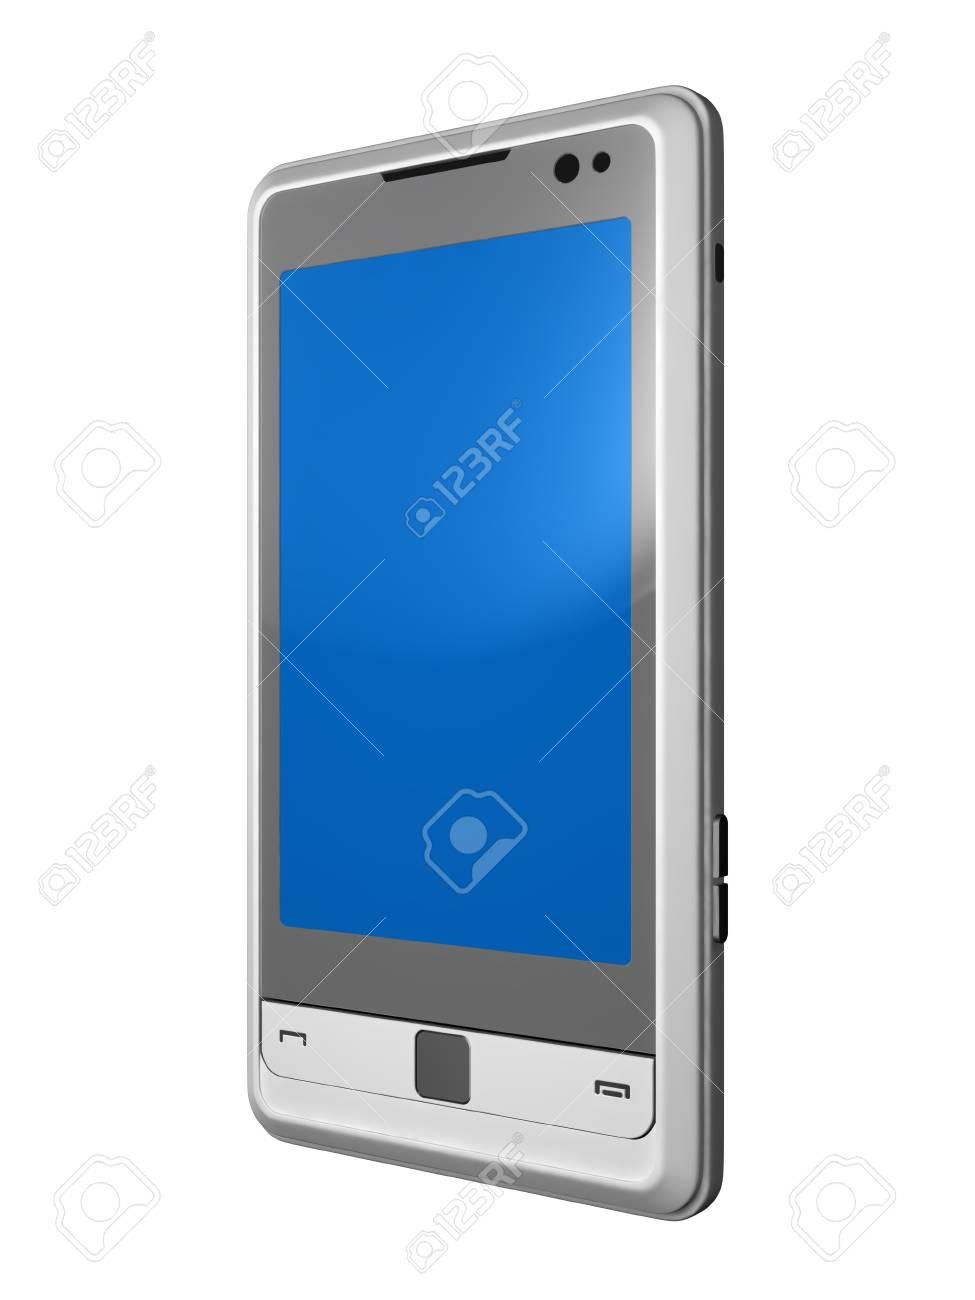 mobile telephone isolated on white Stock Photo - 10161816